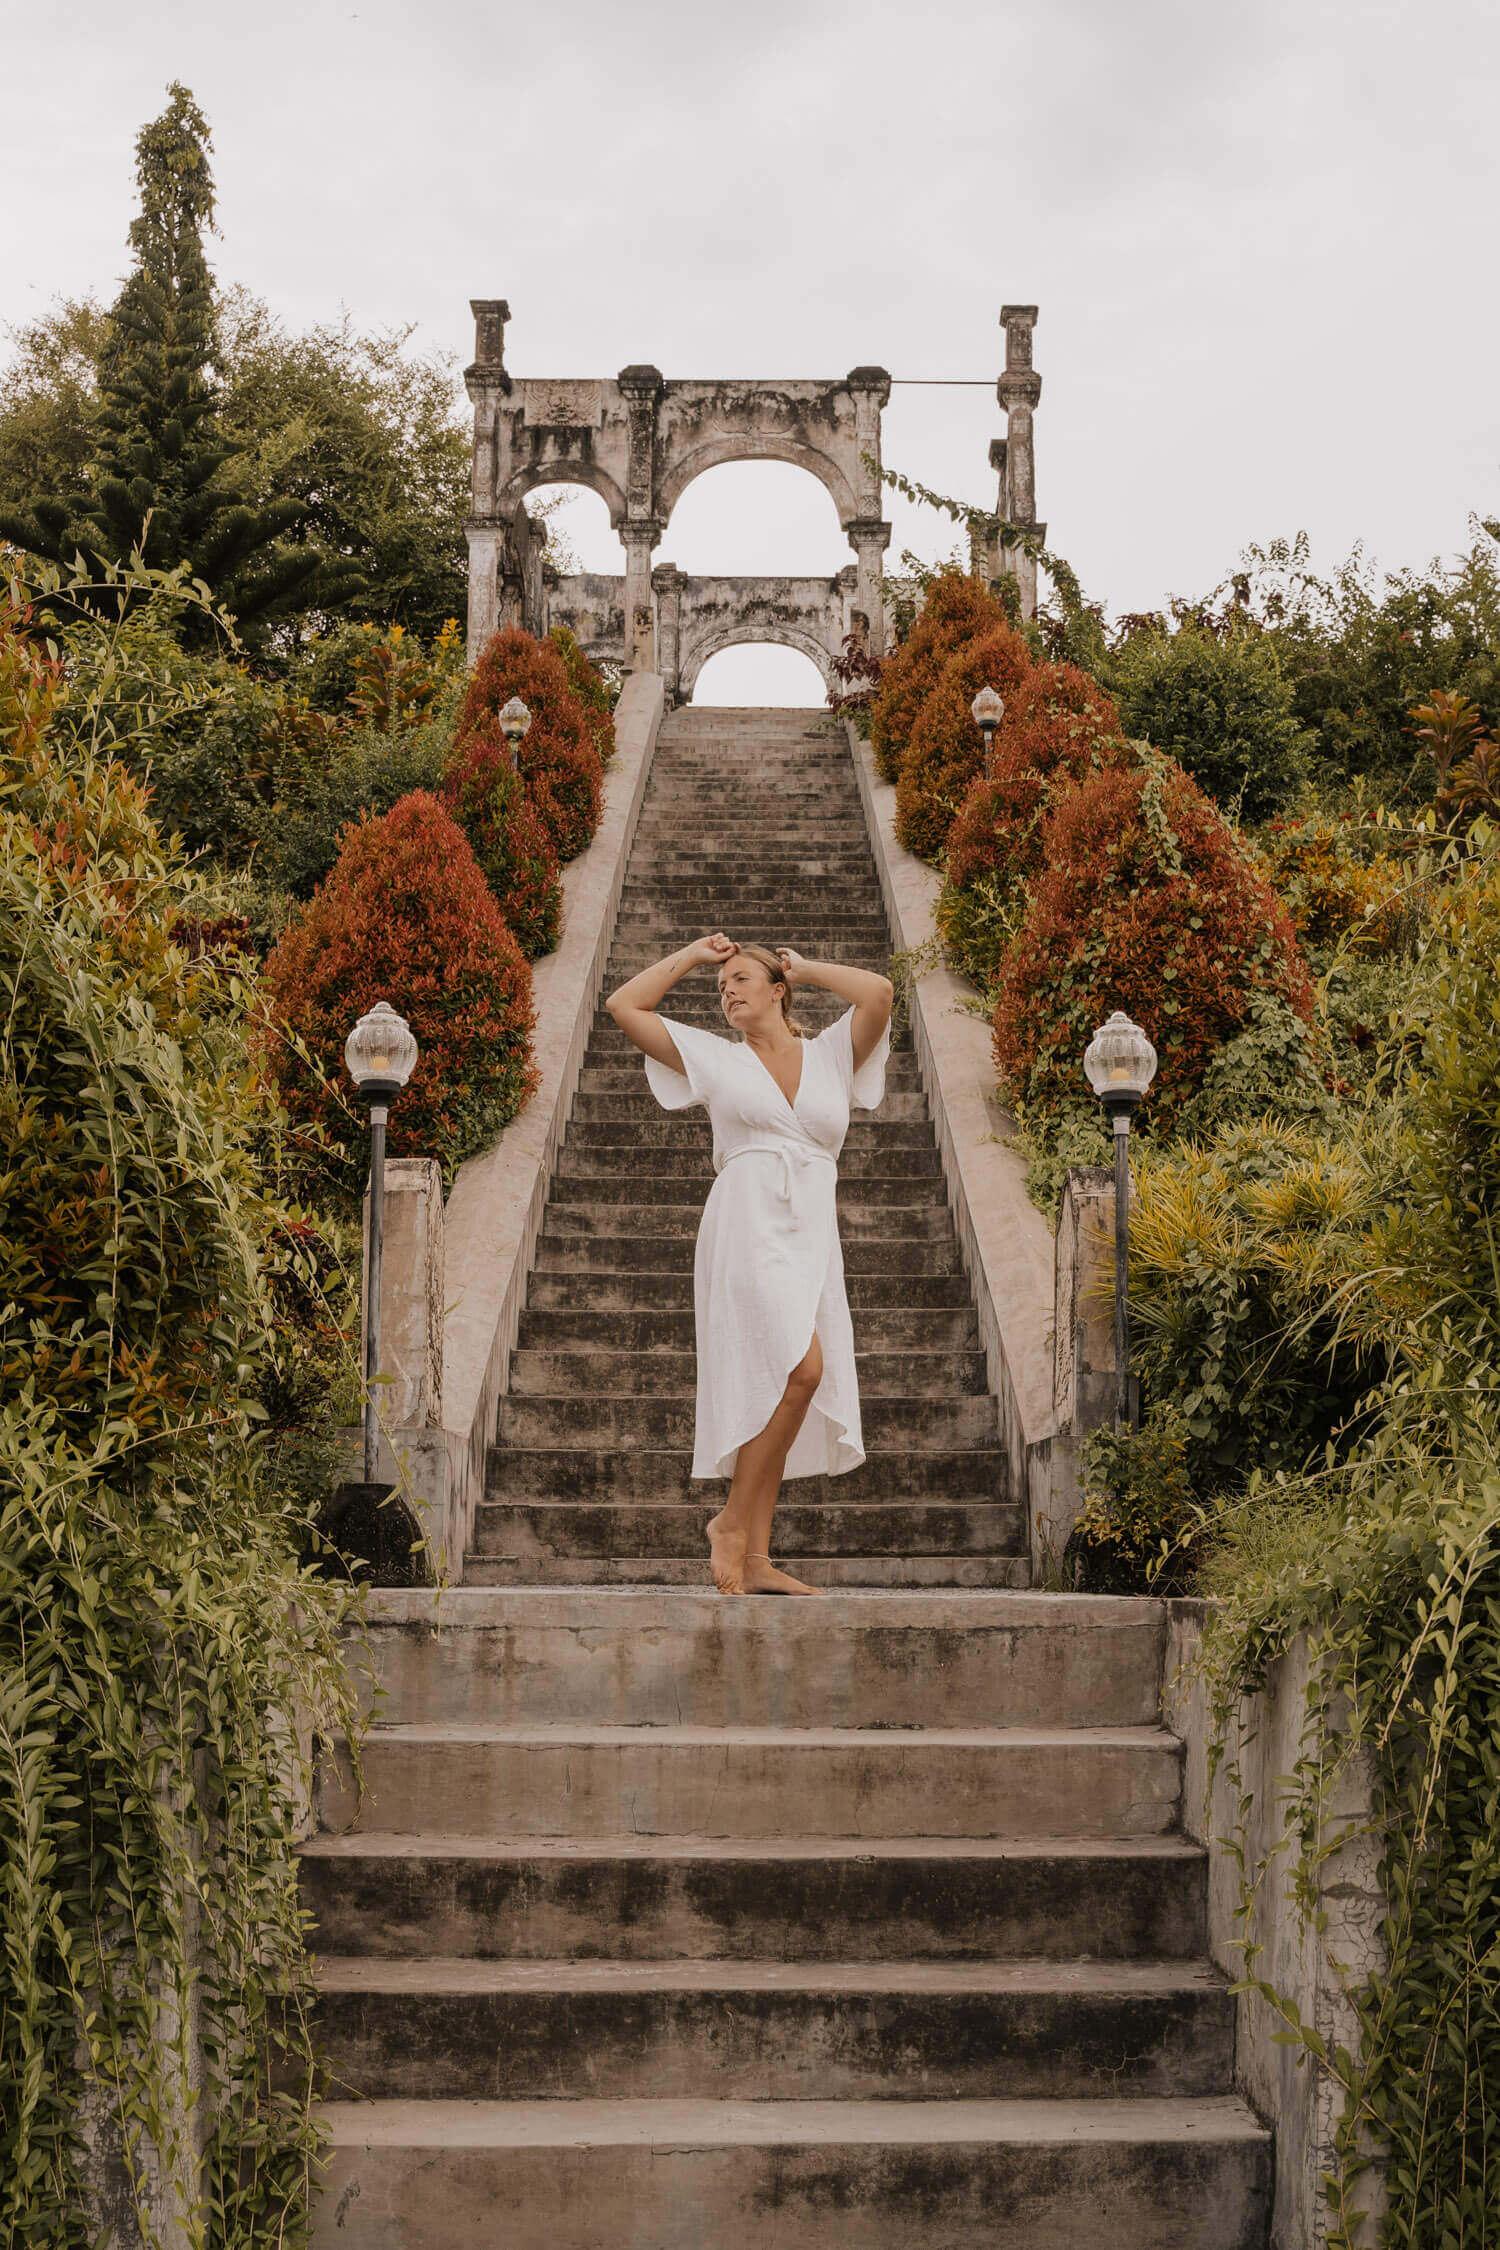 Taman Ujung Water Palace Bali Instagram Spots